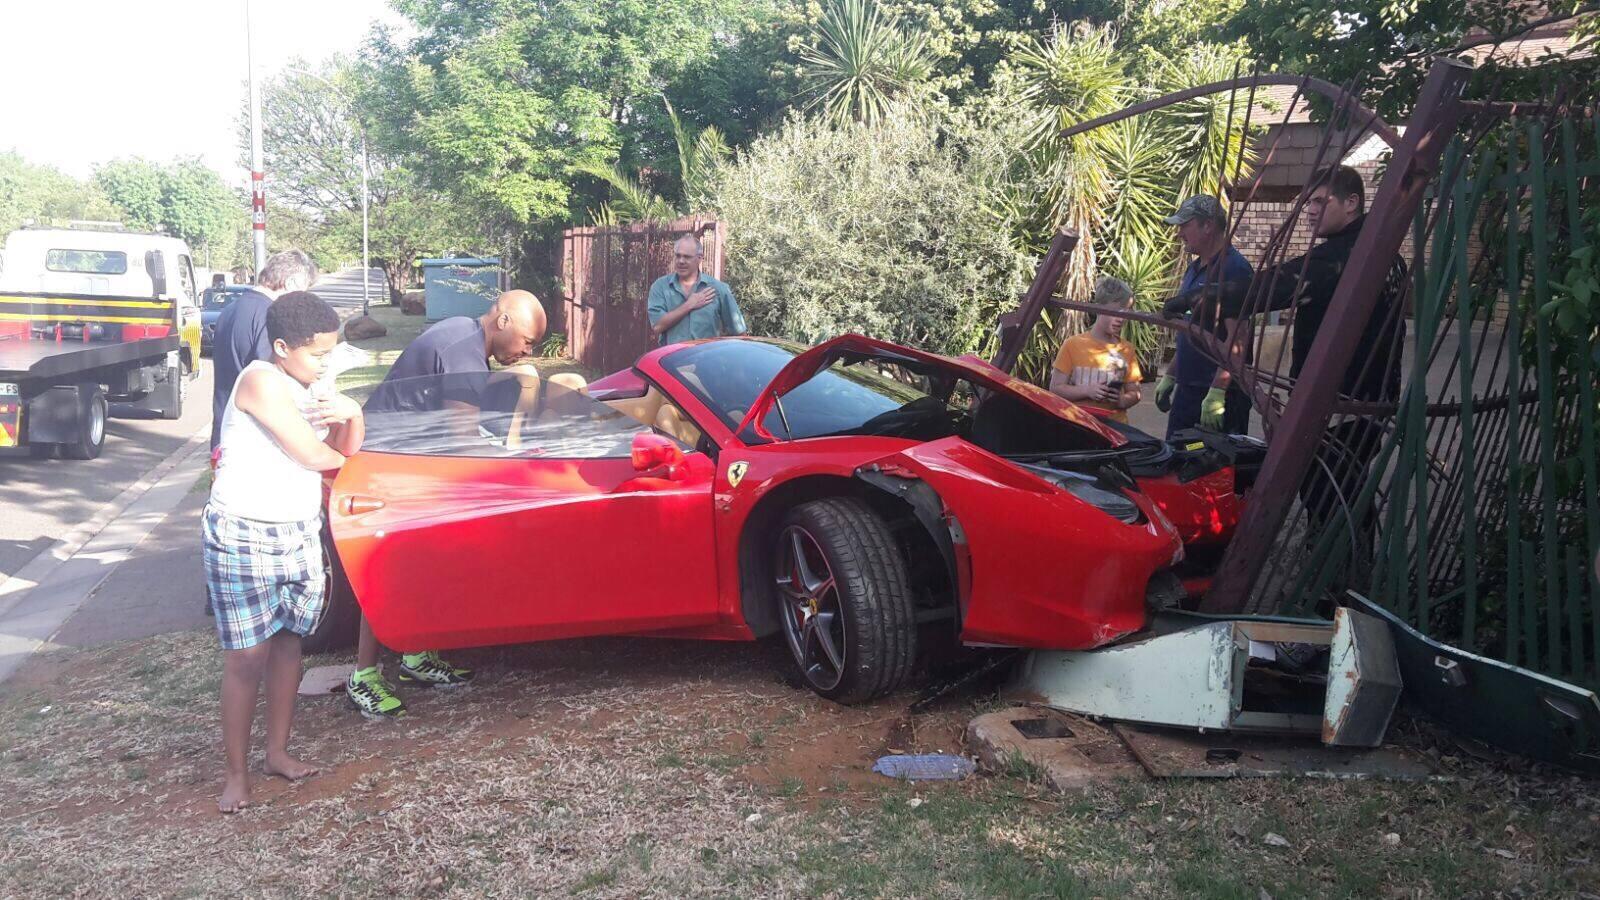 Ferrari 458 Spider Damaged In South African Crash